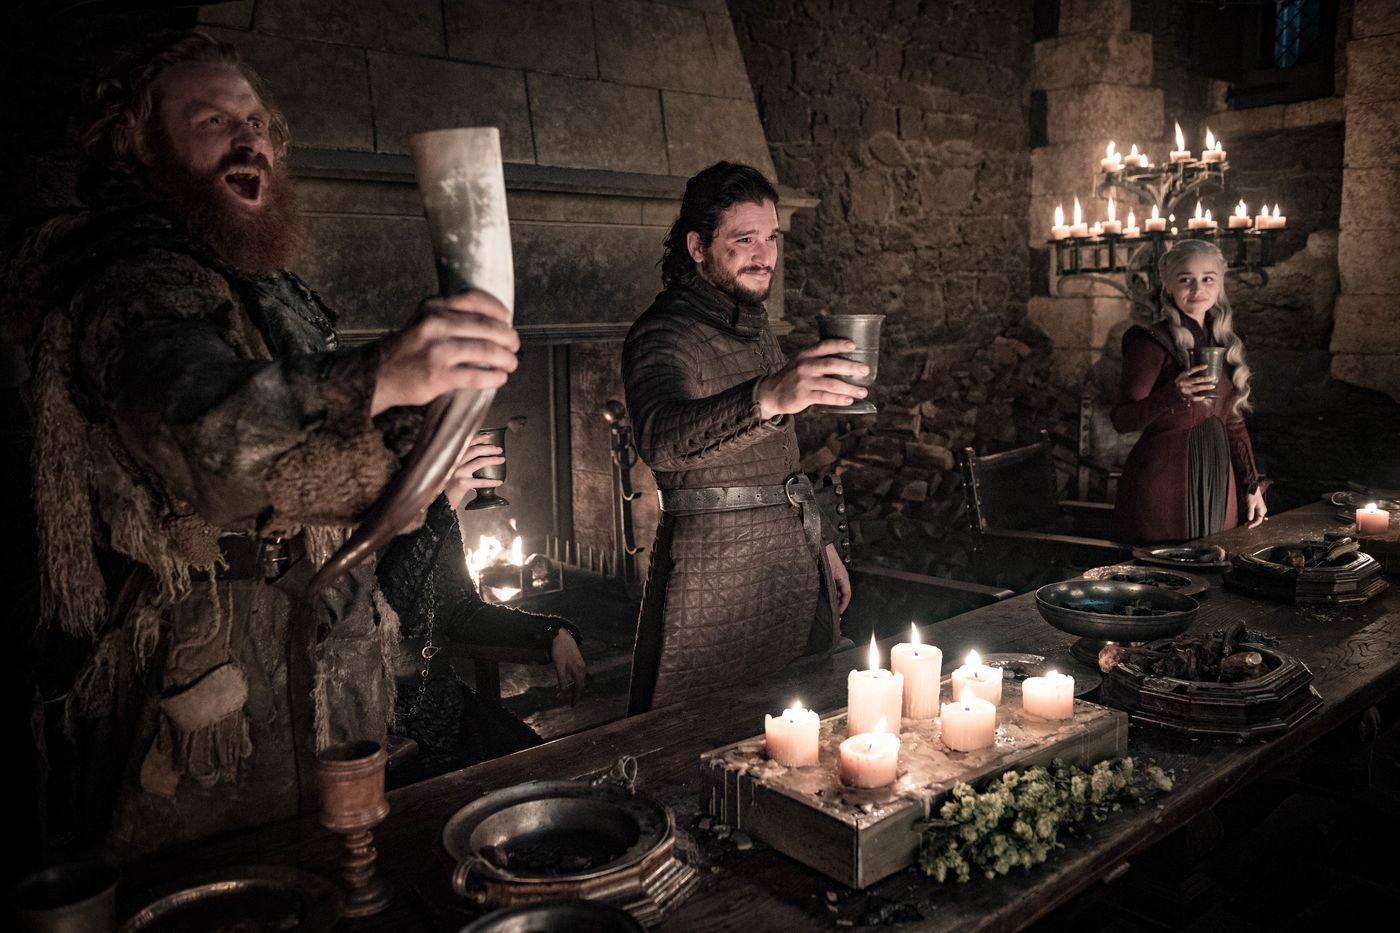 Download Game of thrones season 8 episode 4. www.eremmel.com